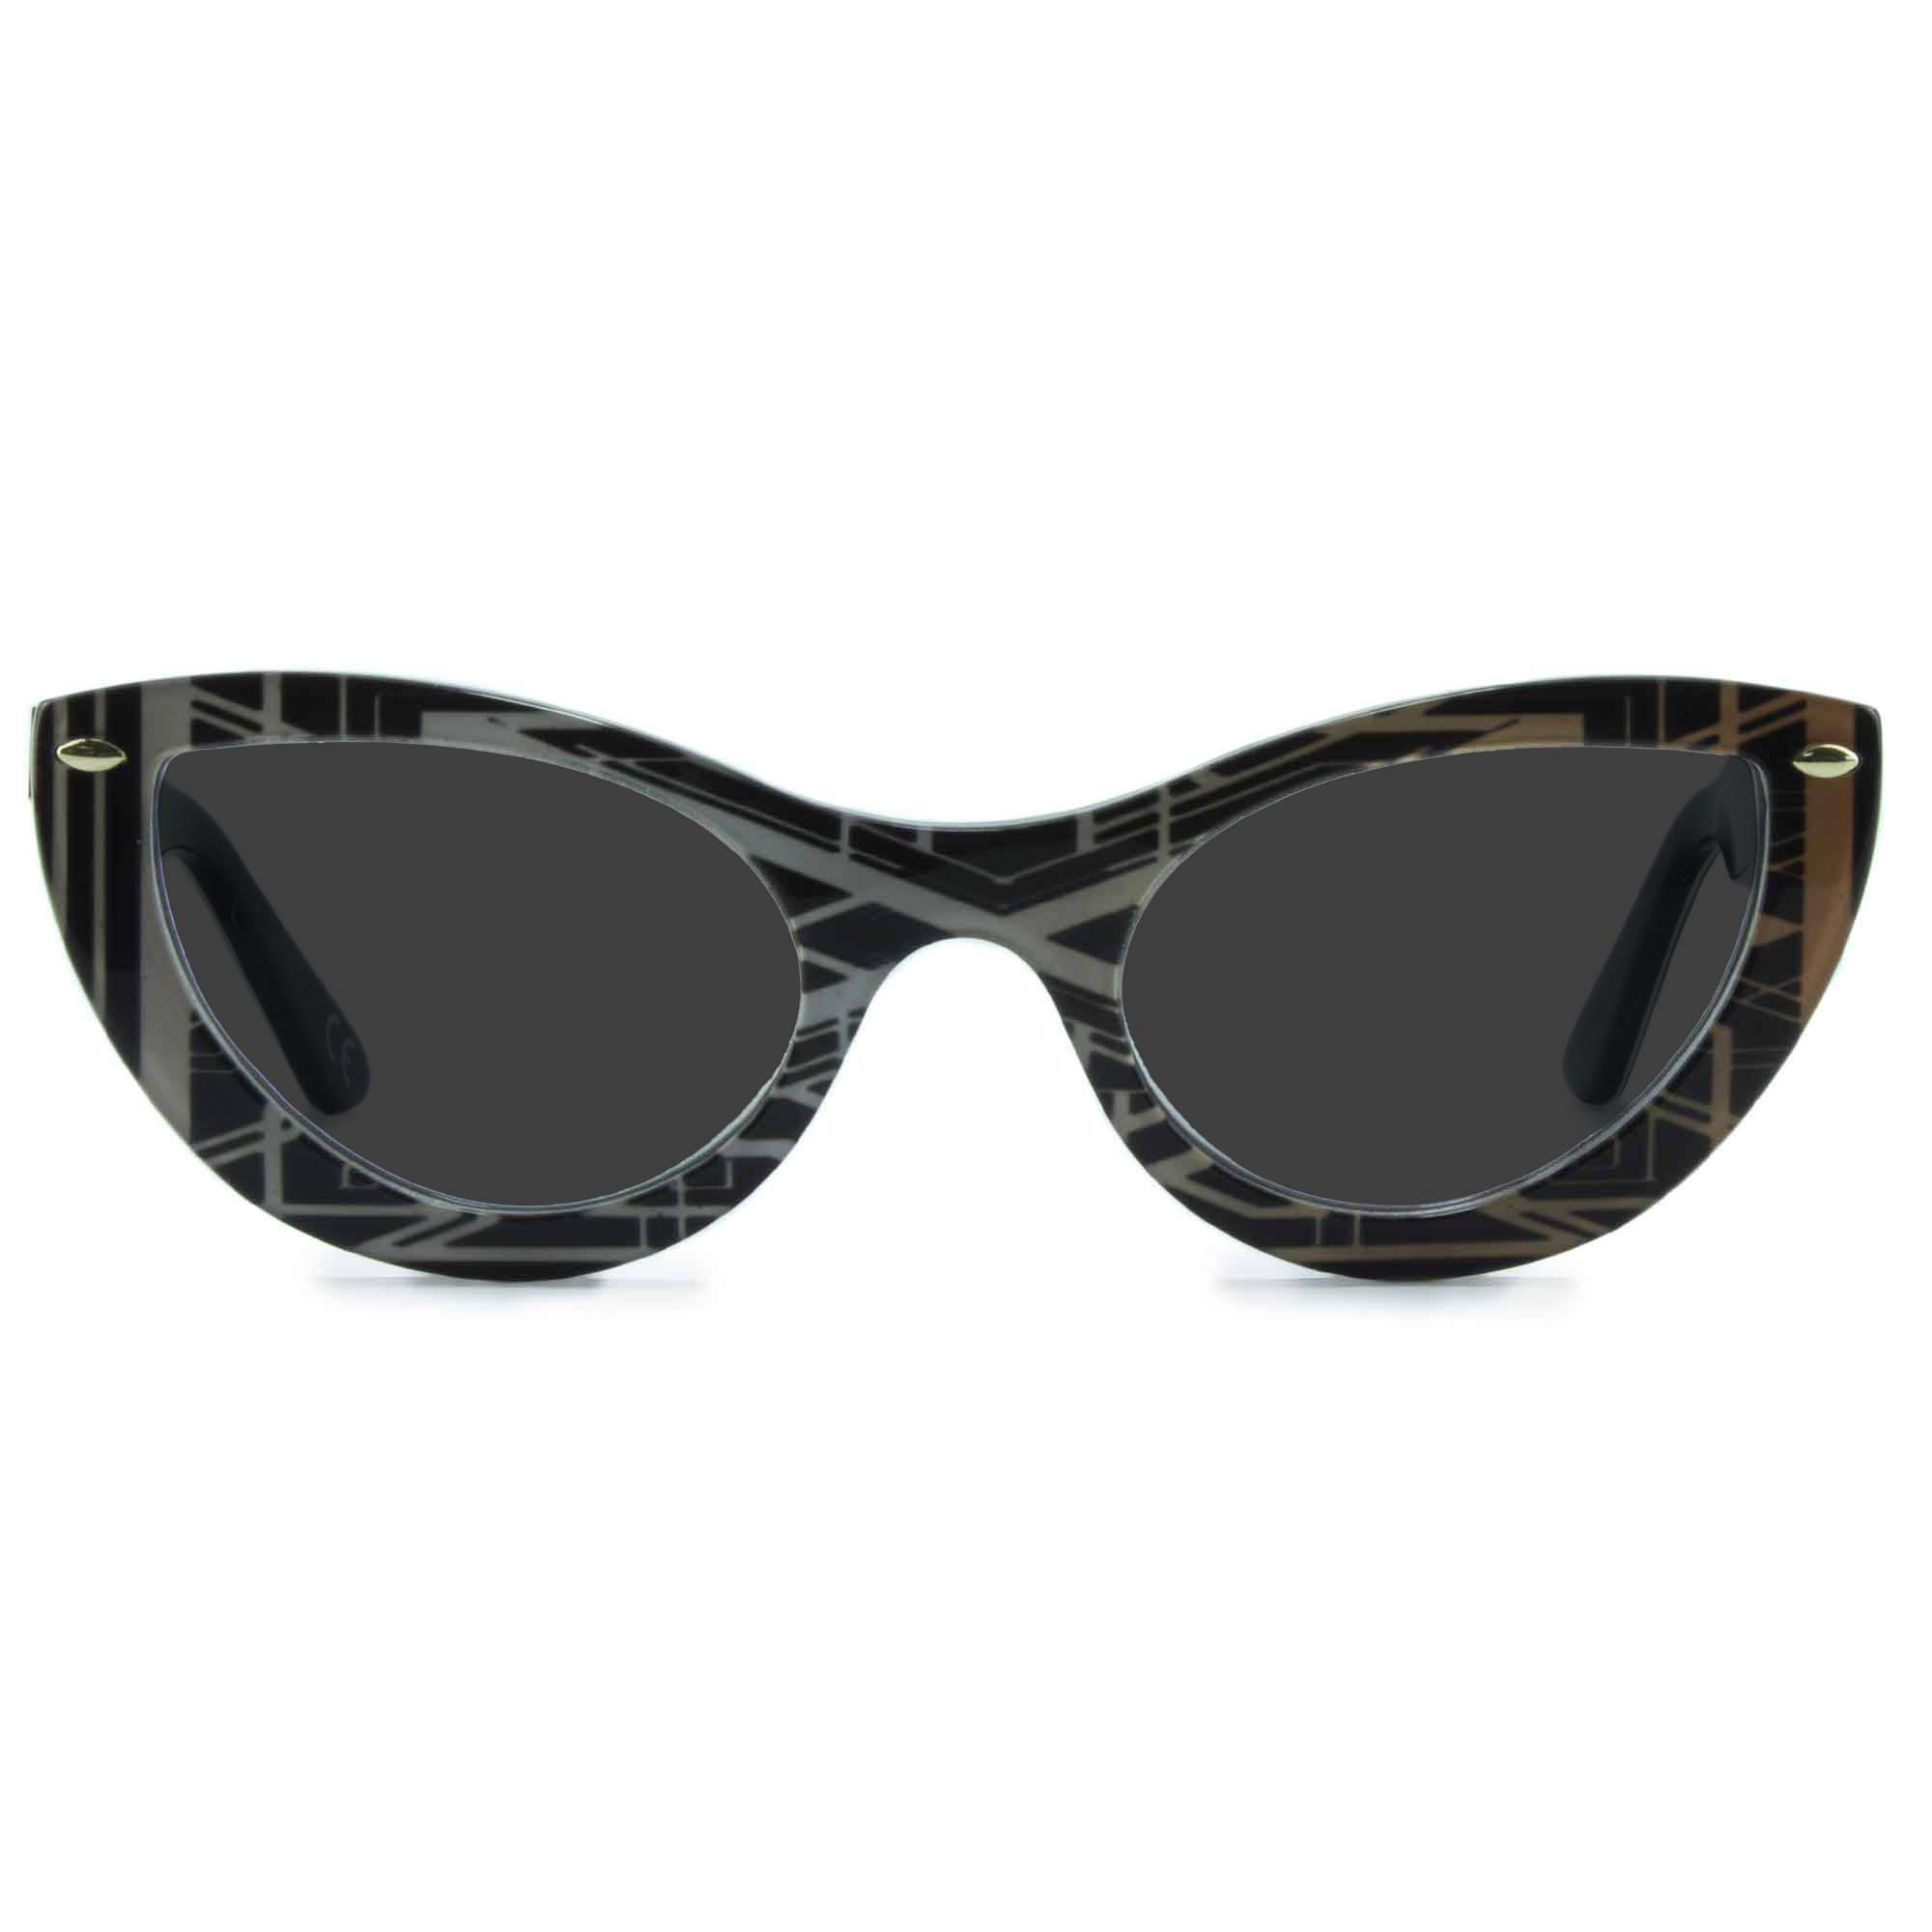 Joiuss gatsby black & gold cat eye sunglasses